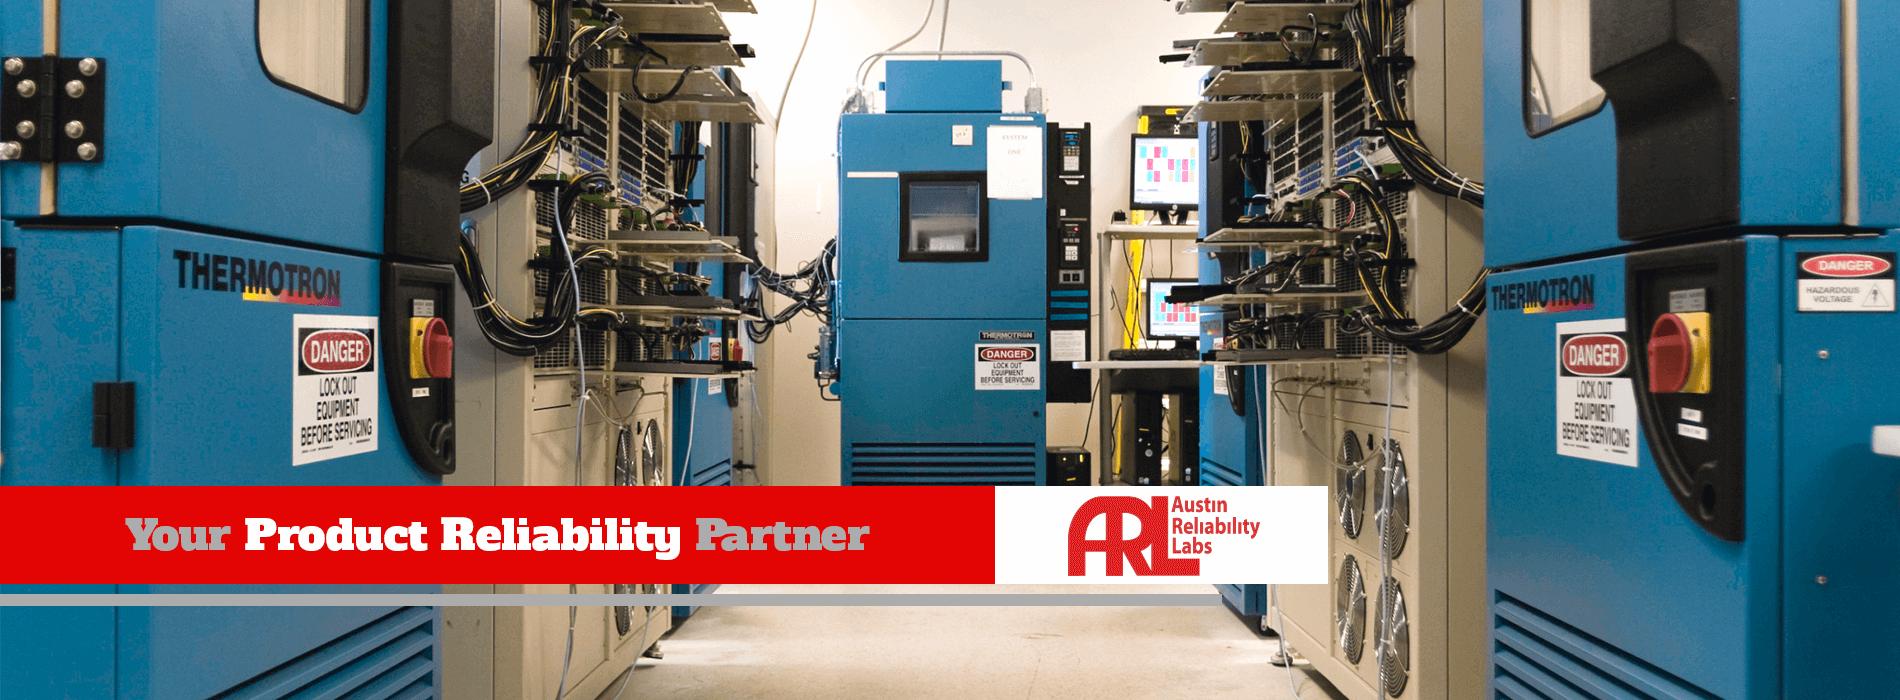 TyRex Photo: Austin Reliability Labs